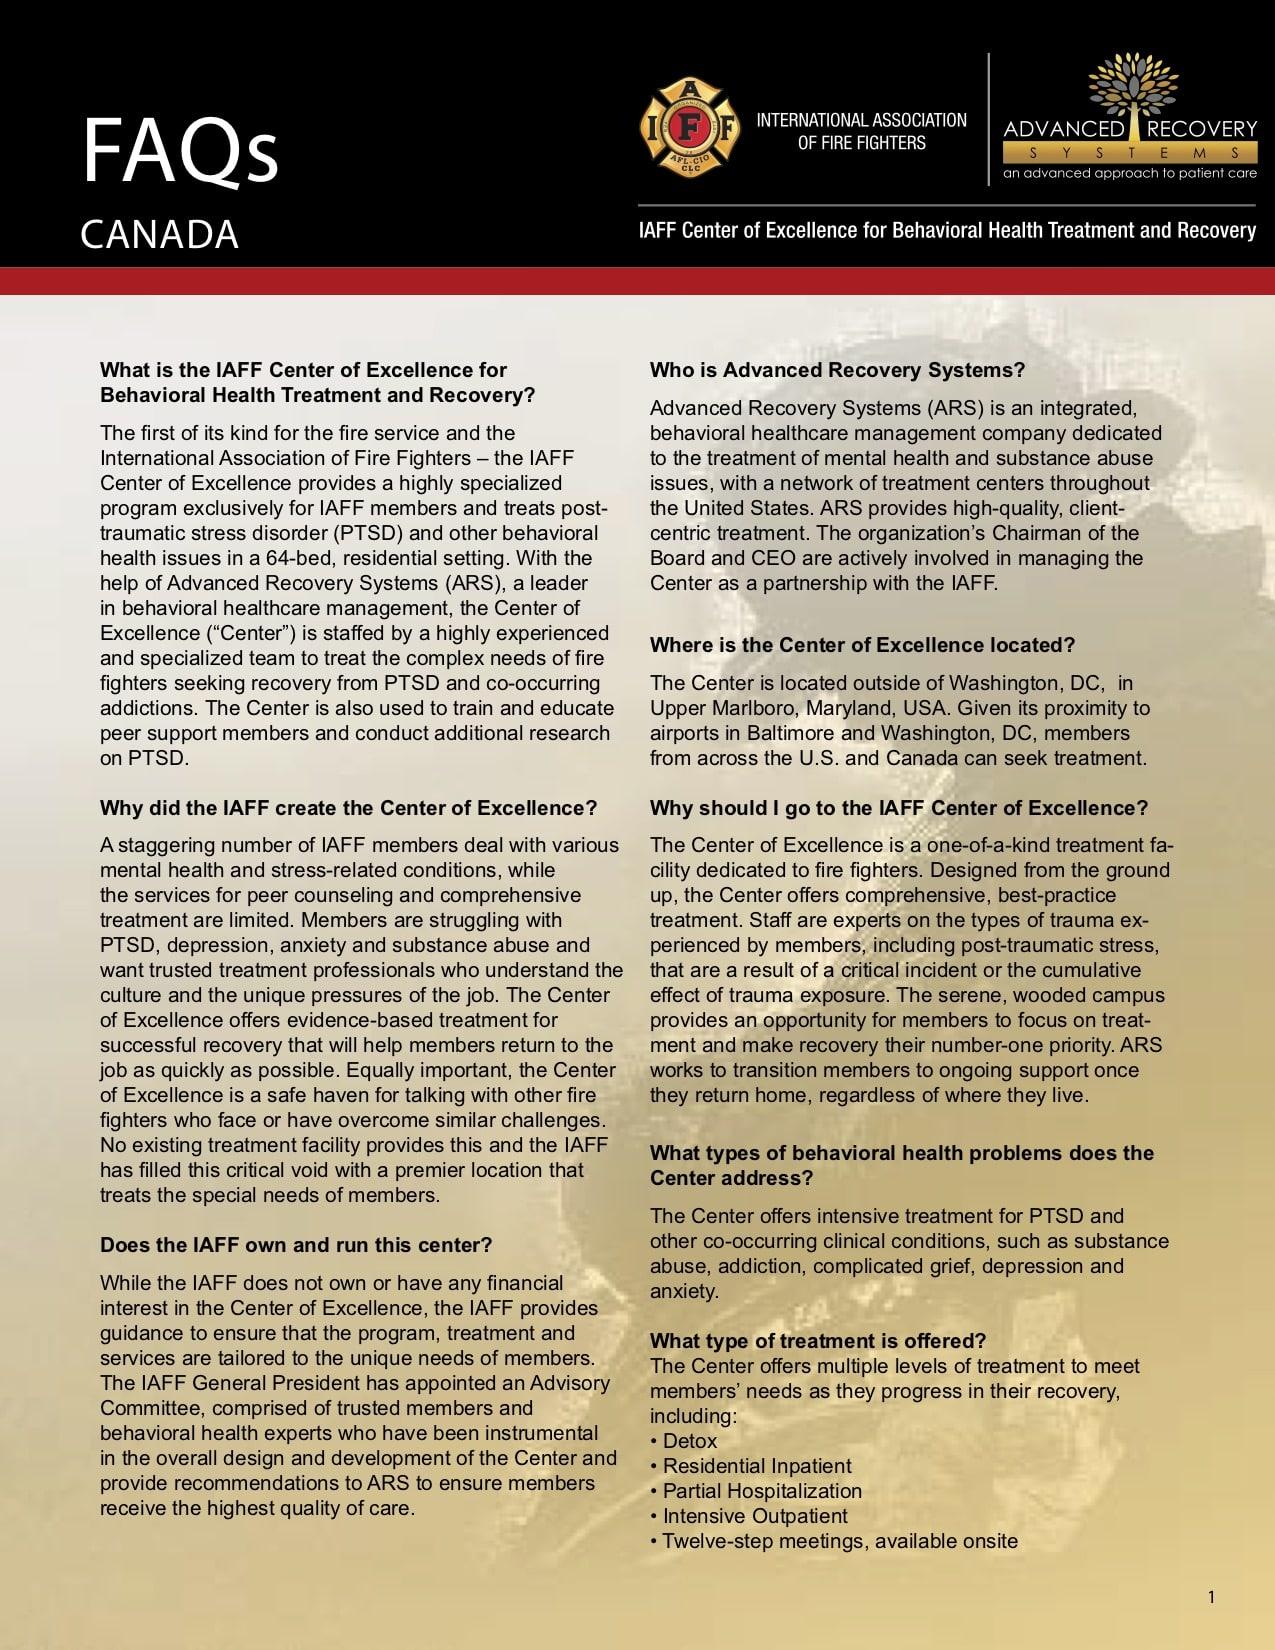 FAQs (Canada)